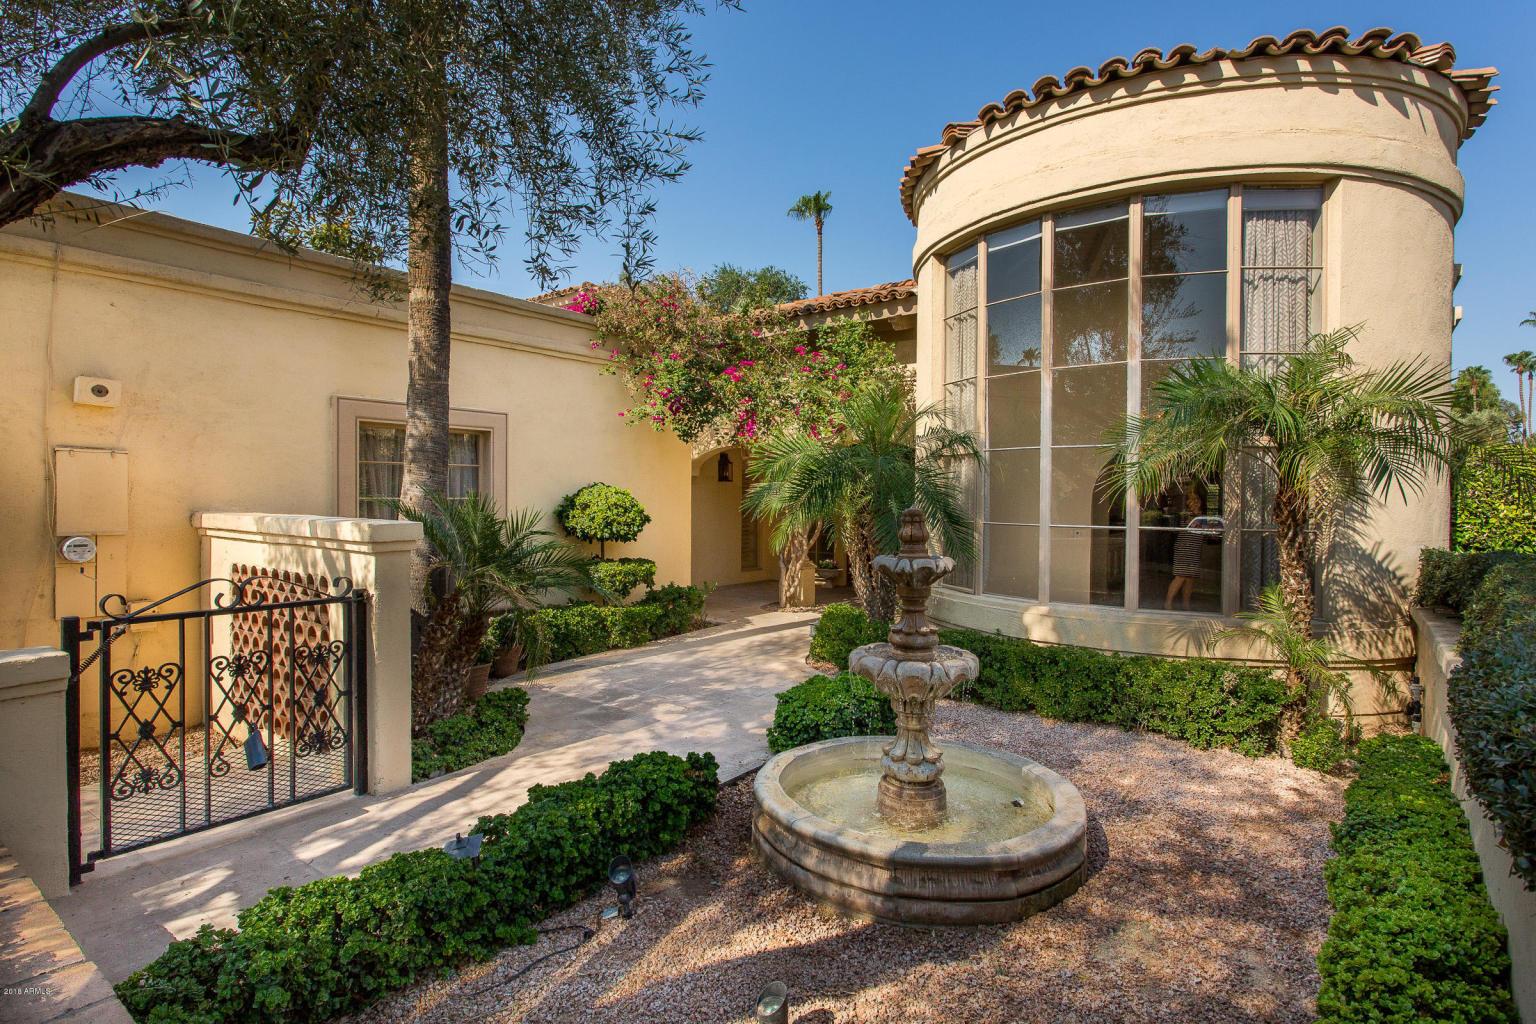 7500 E McCormick Pkwy 51, Scottsdale | $685,000